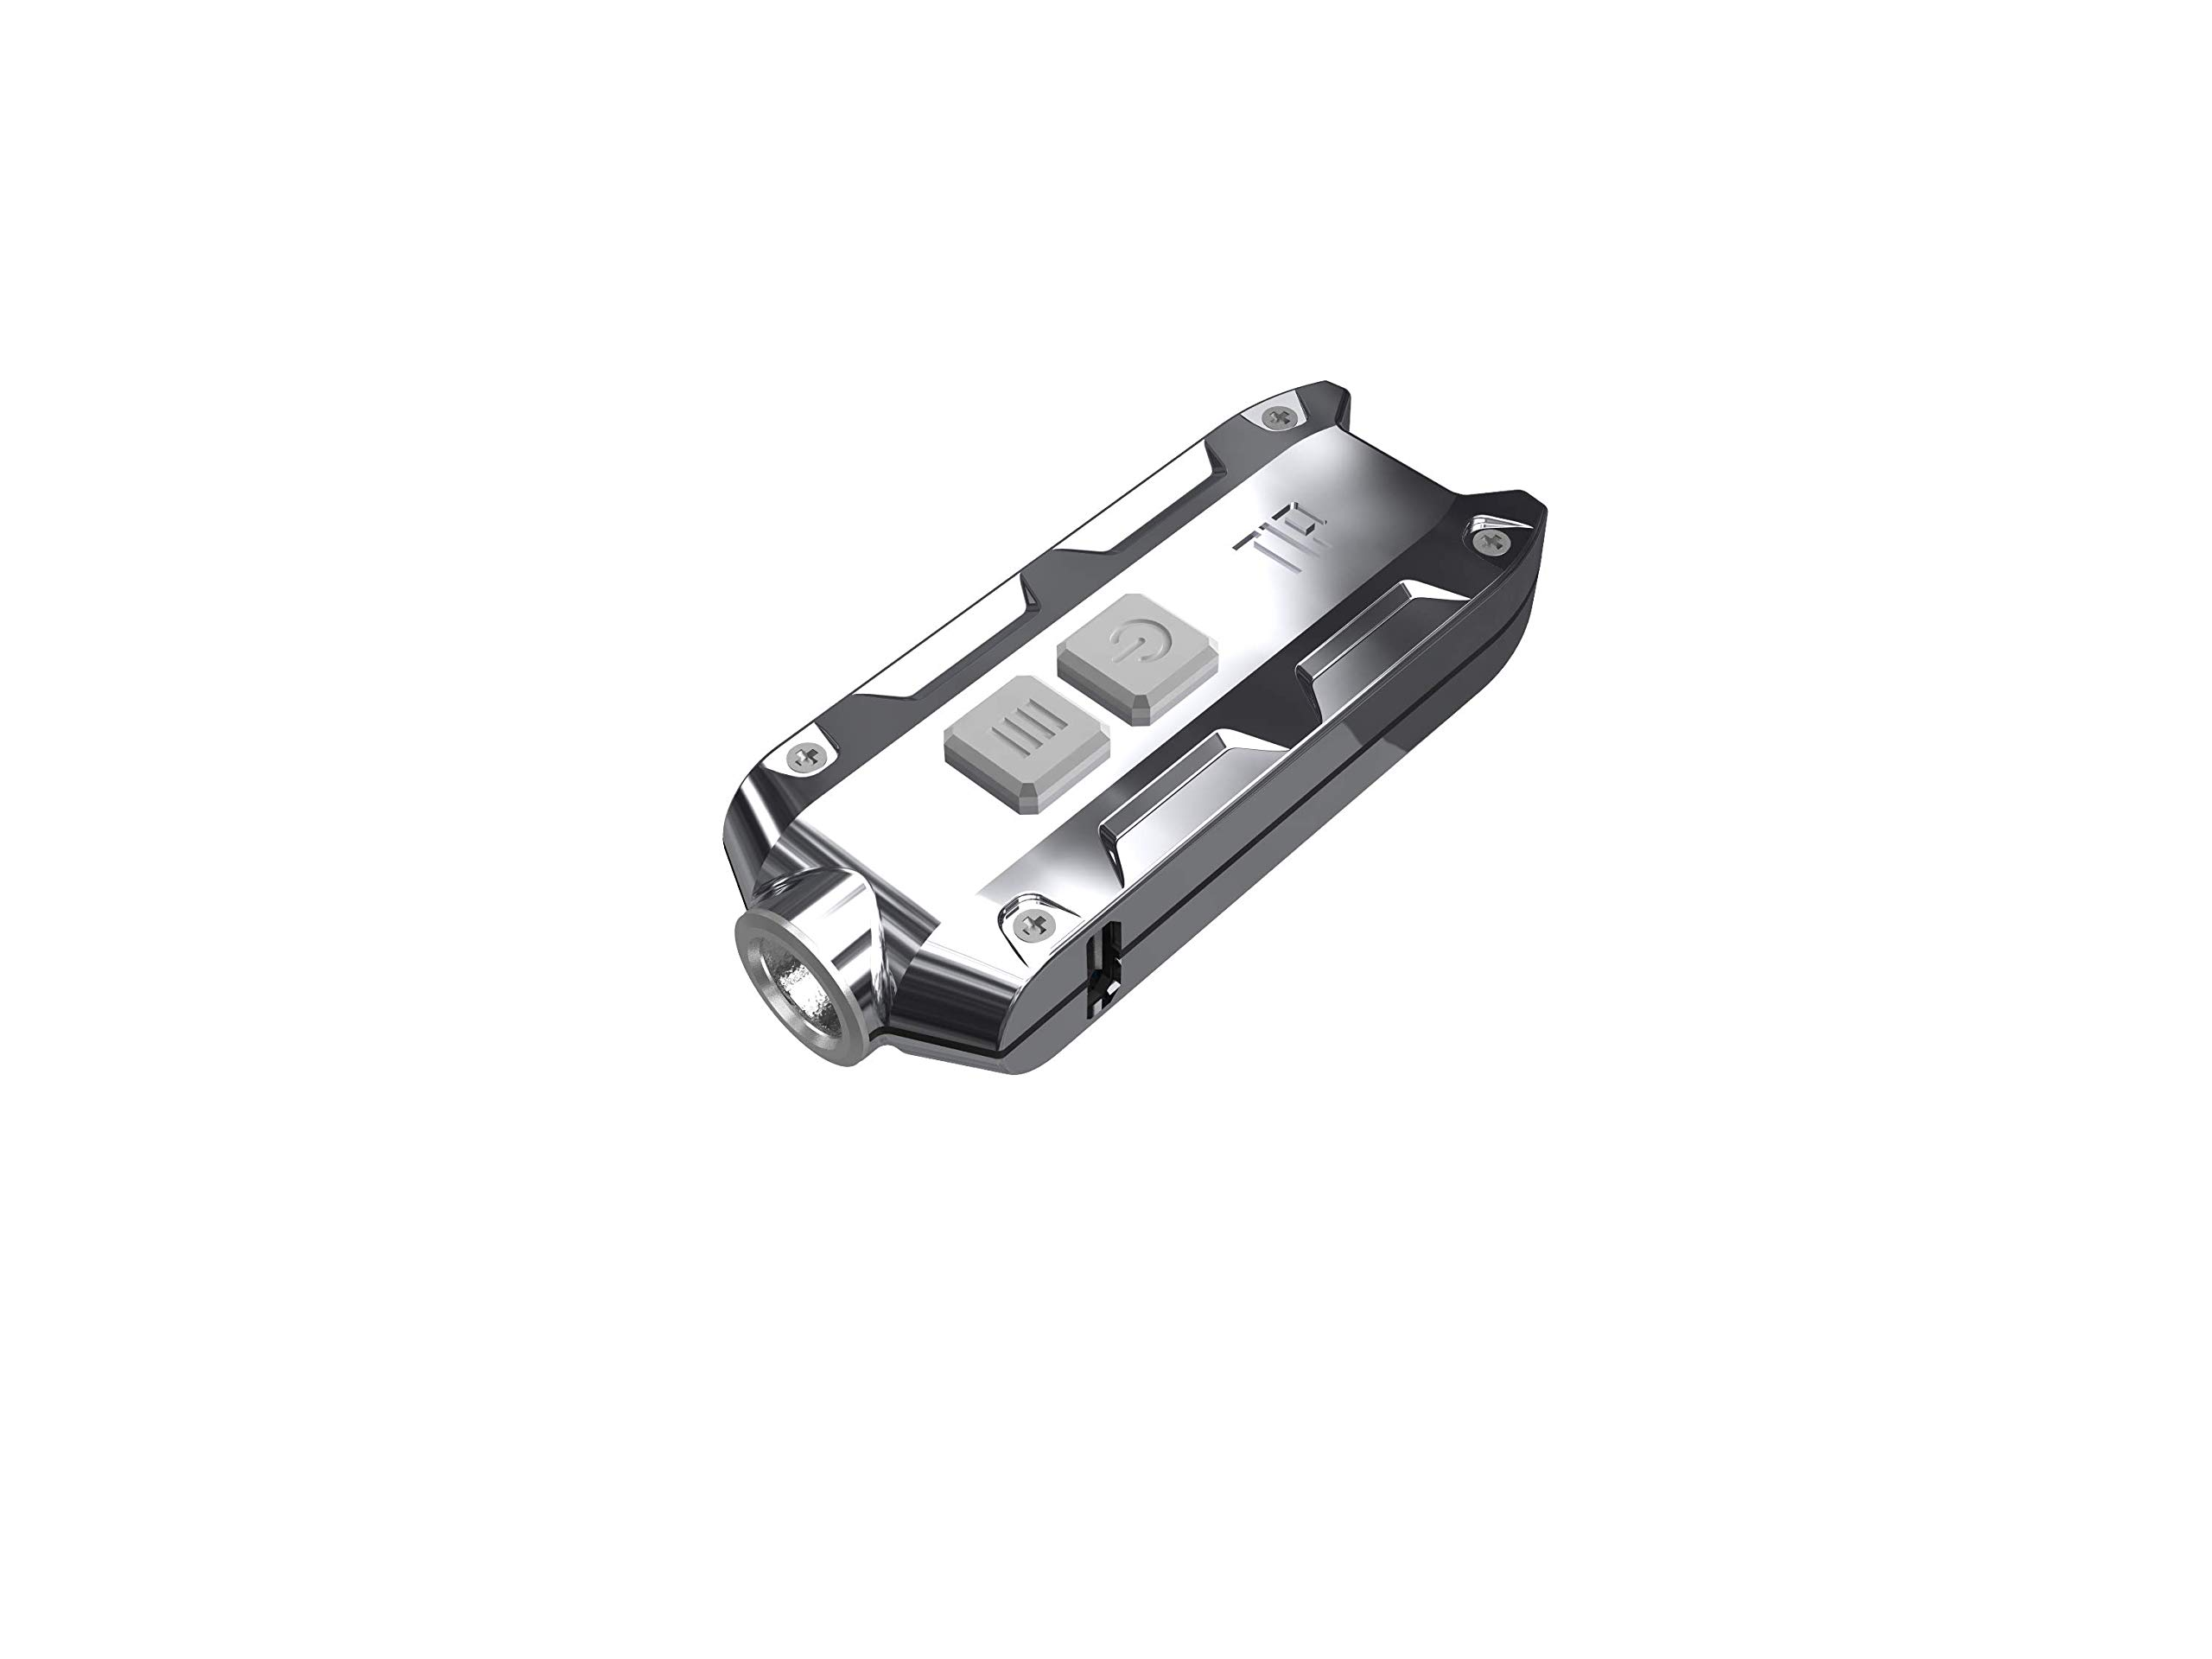 Linternas : Nitecore Tip 360 Lumens Light USB Recharg Glacie